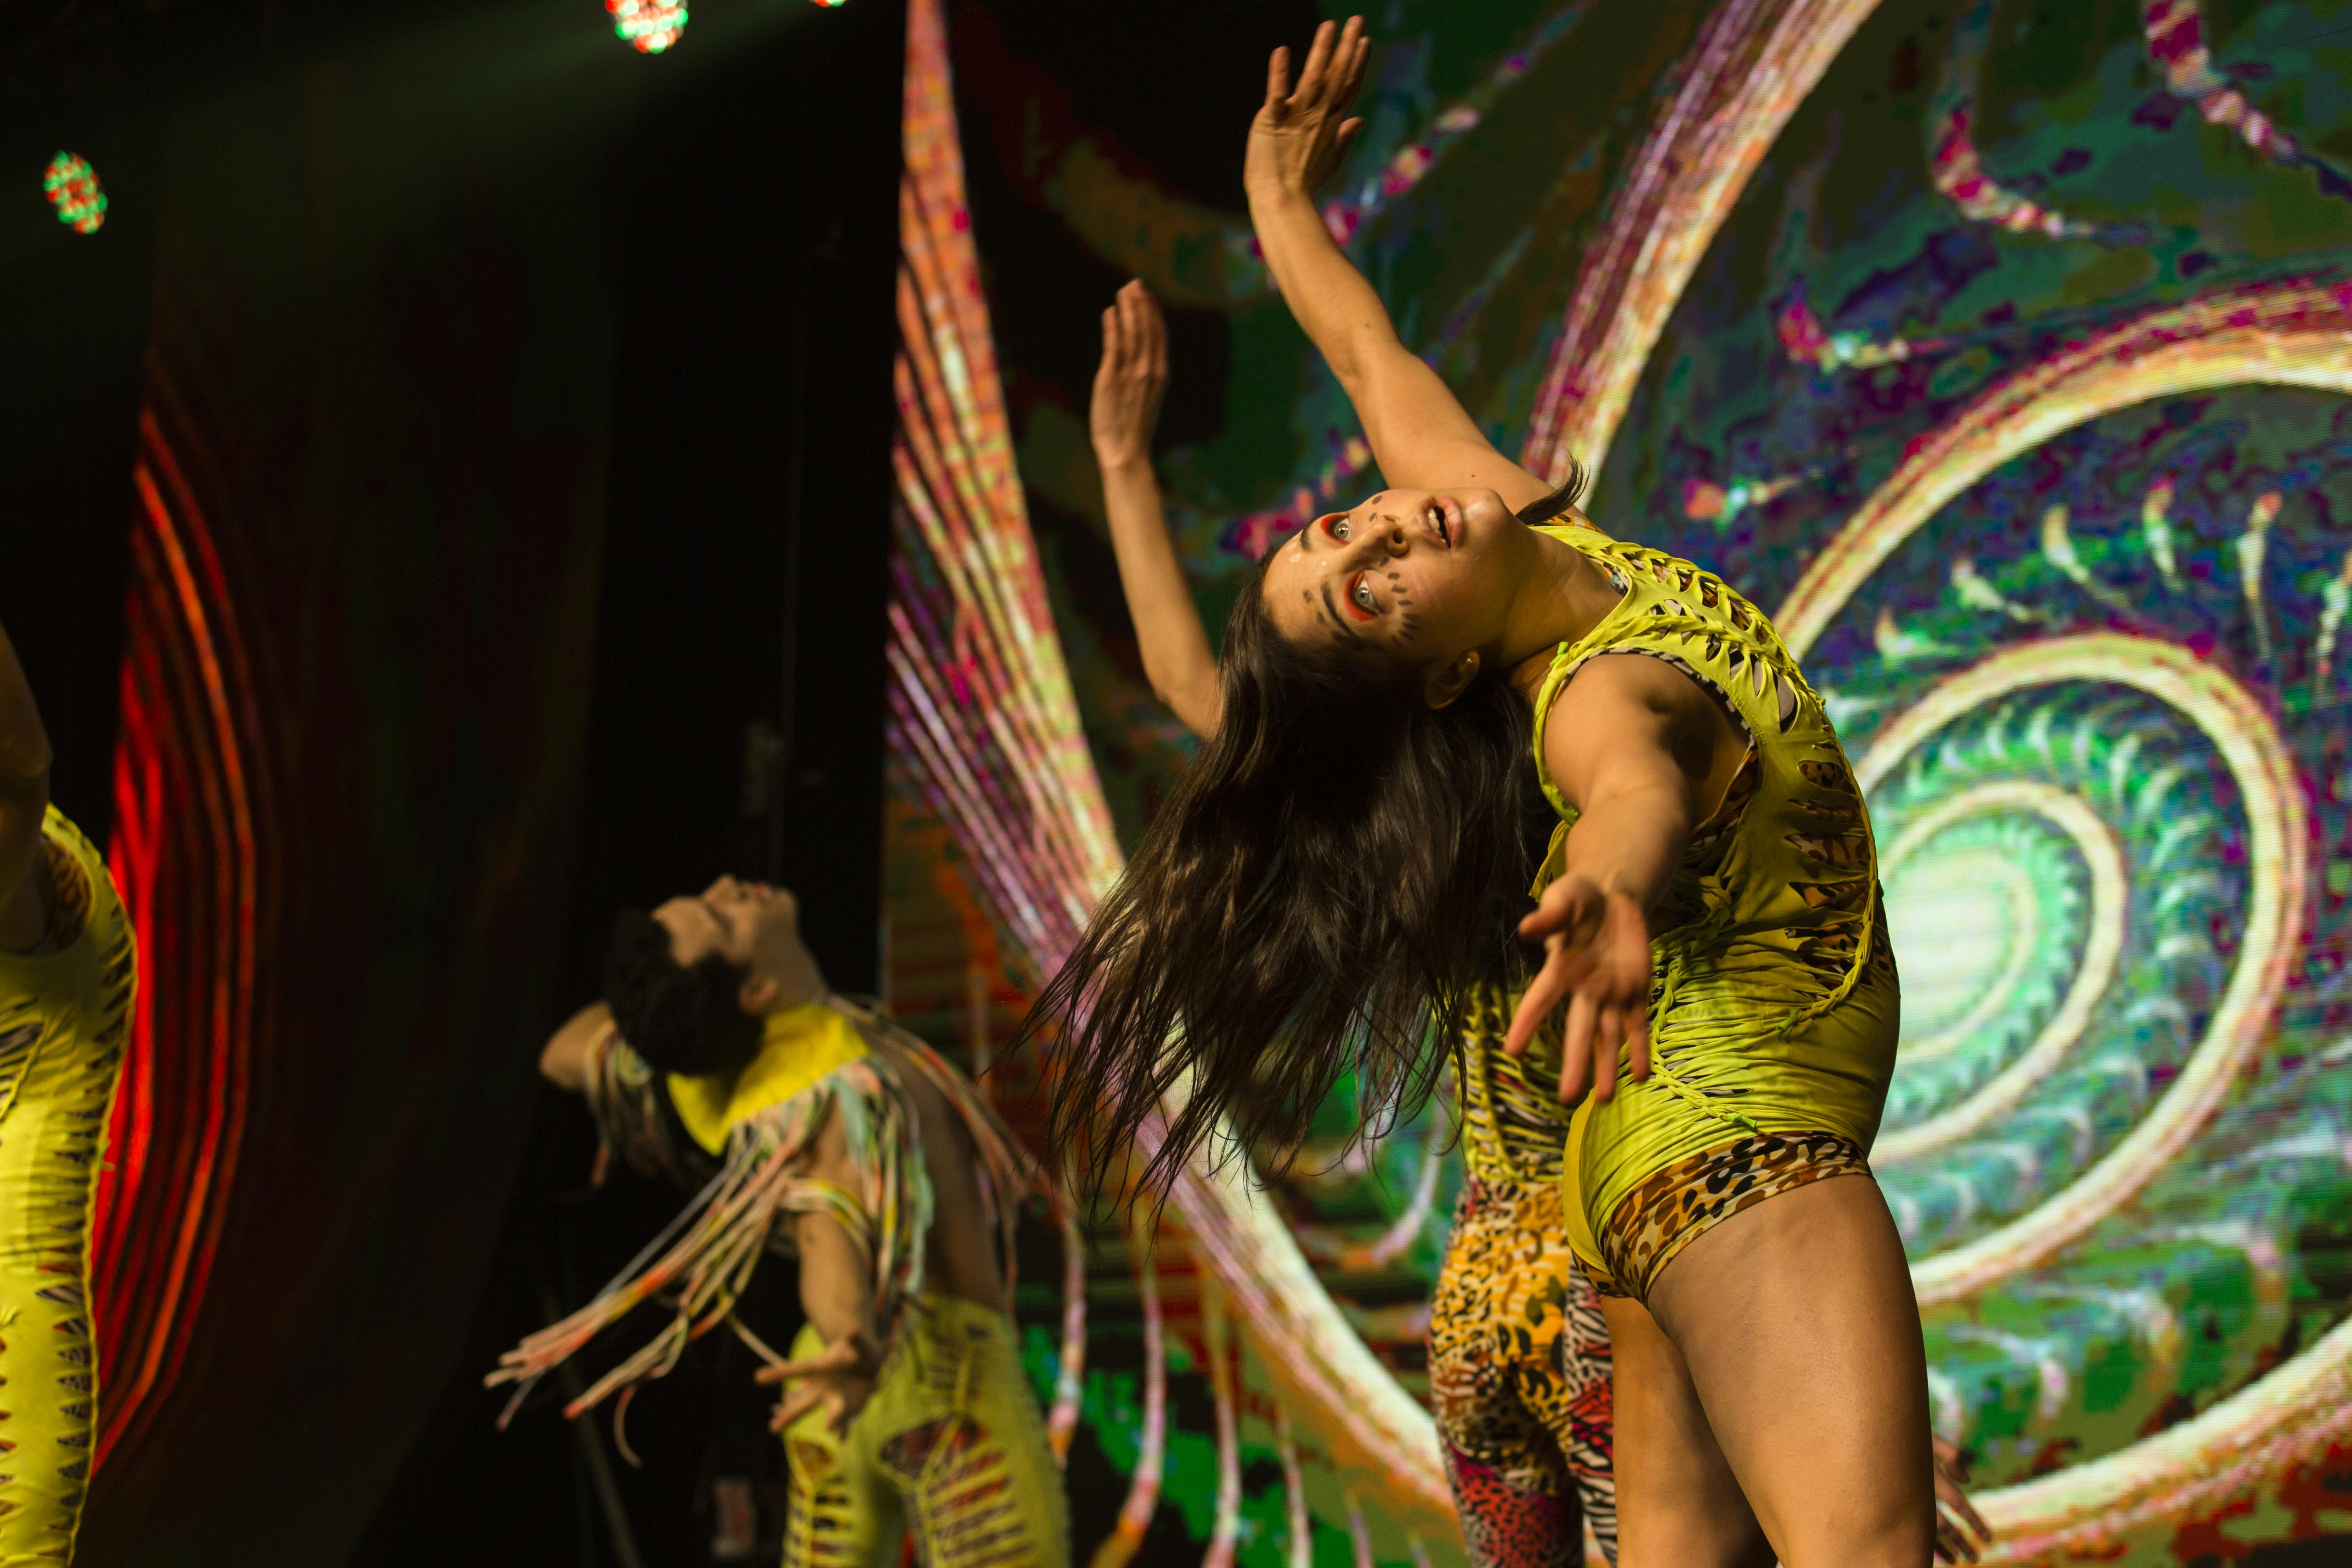 039 - show prismal biogreen - _MAT3415 - Matias Salgado